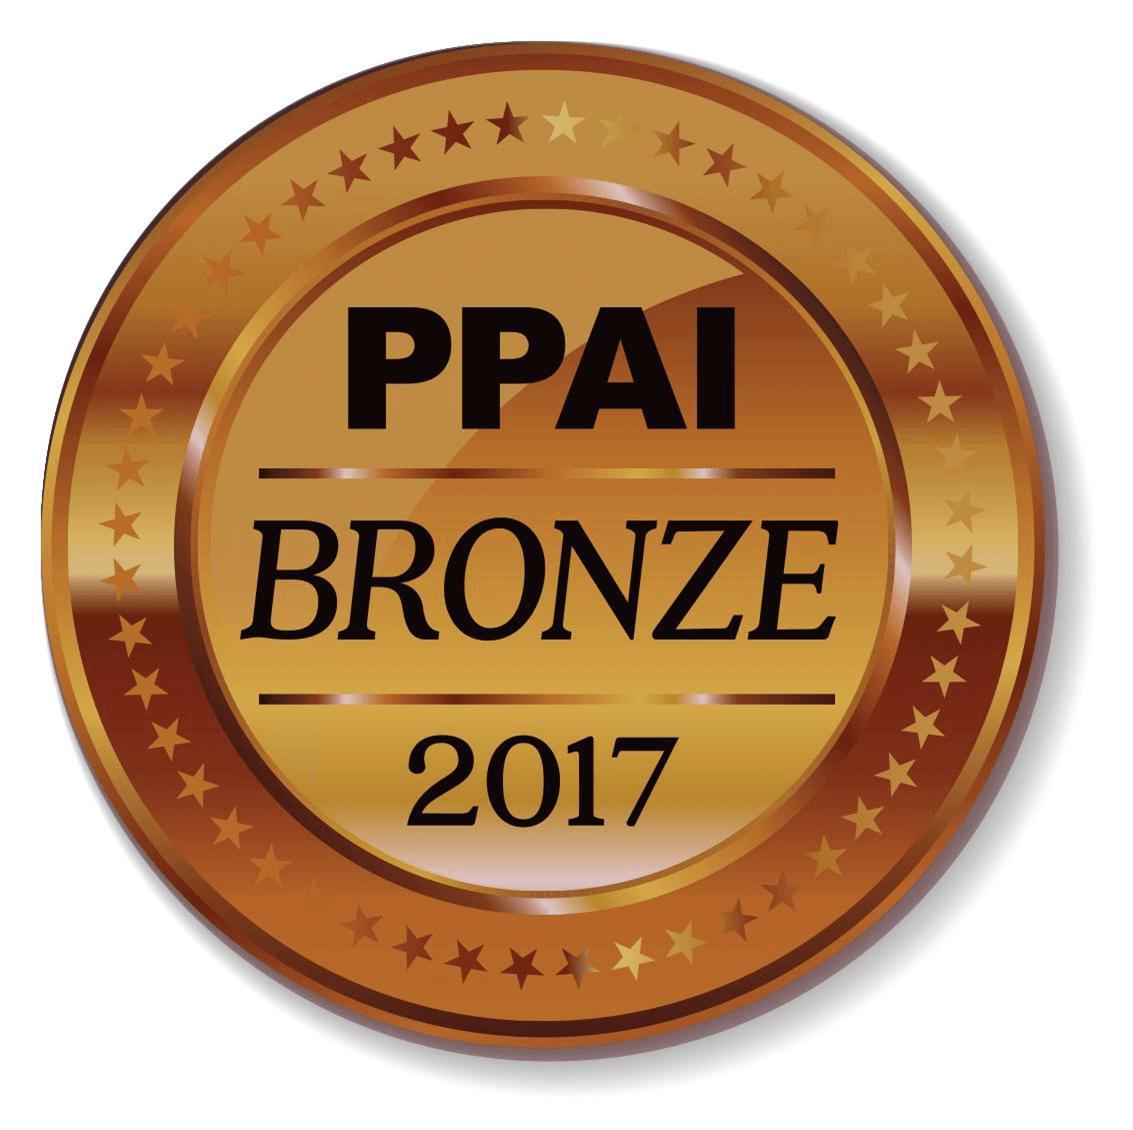 PPAT Bronze